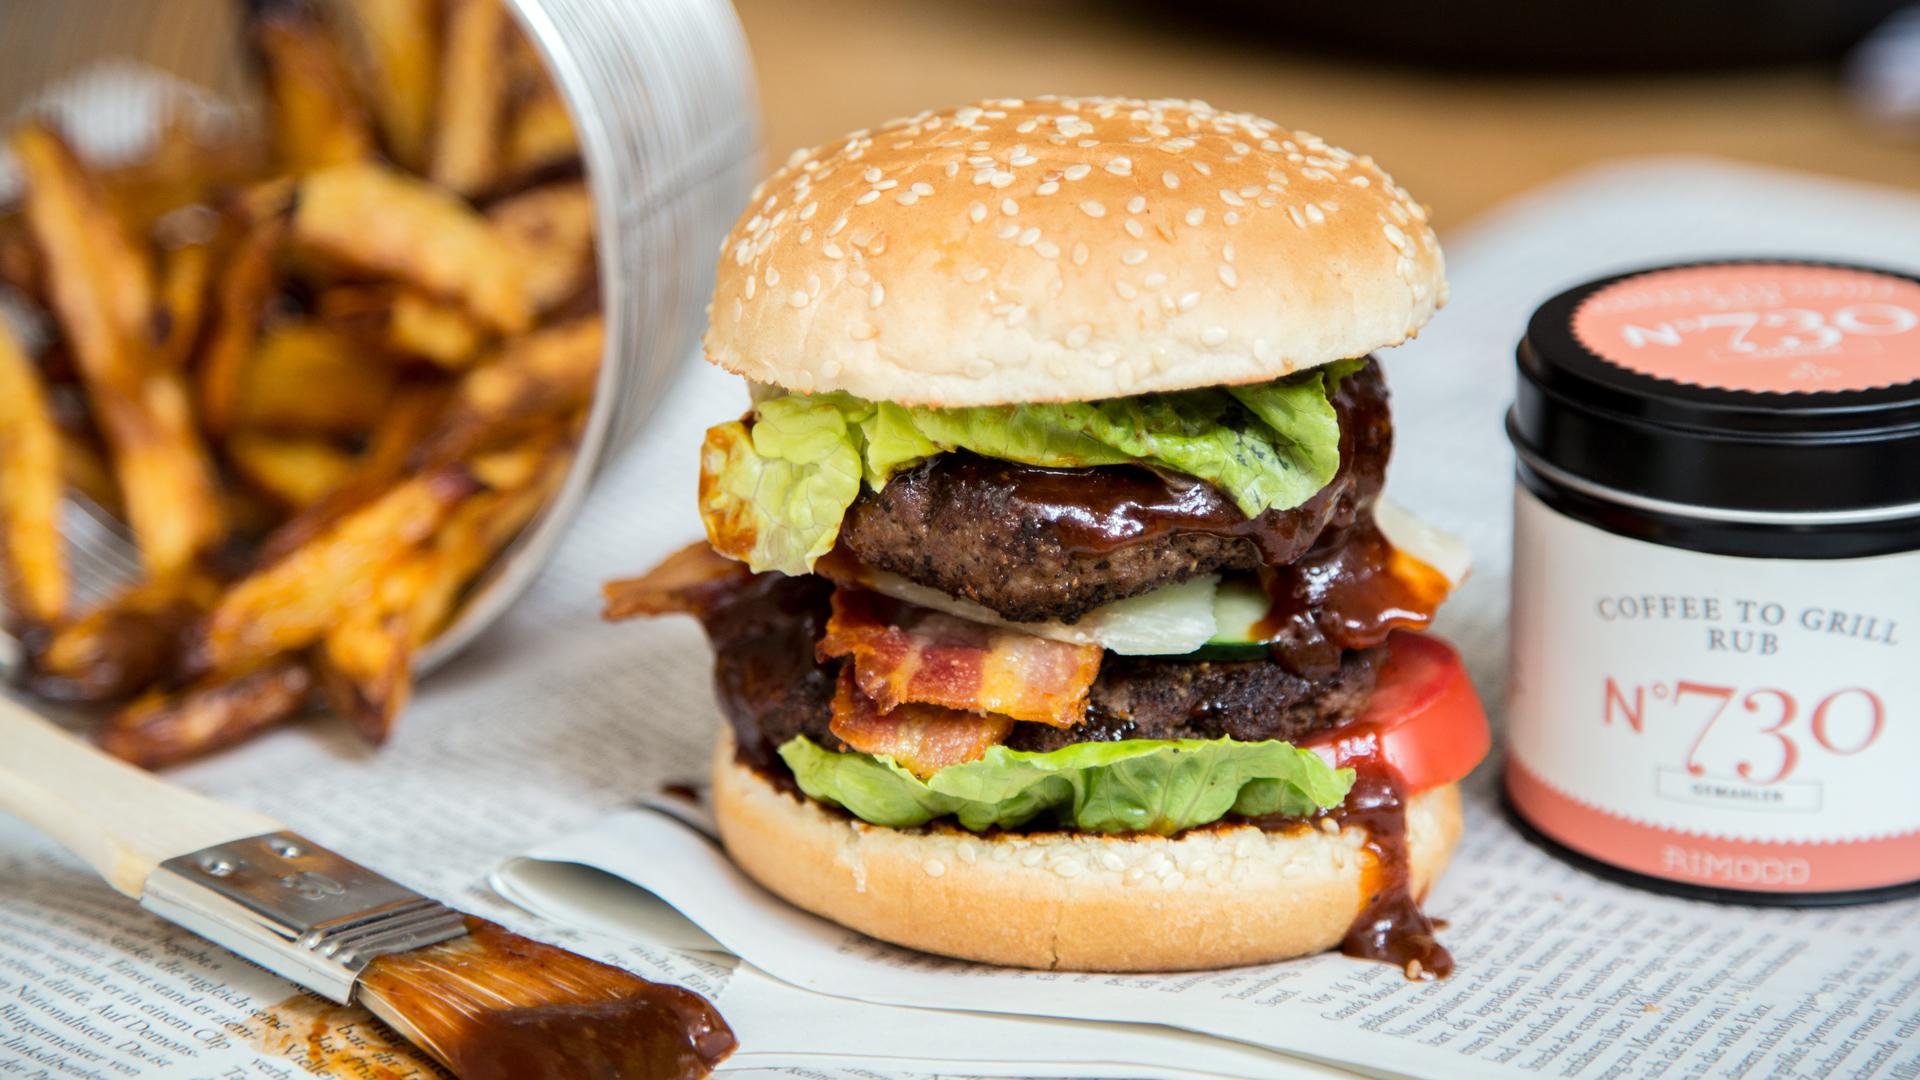 burger-bio-coffee-to-grill-rimoco-16x9